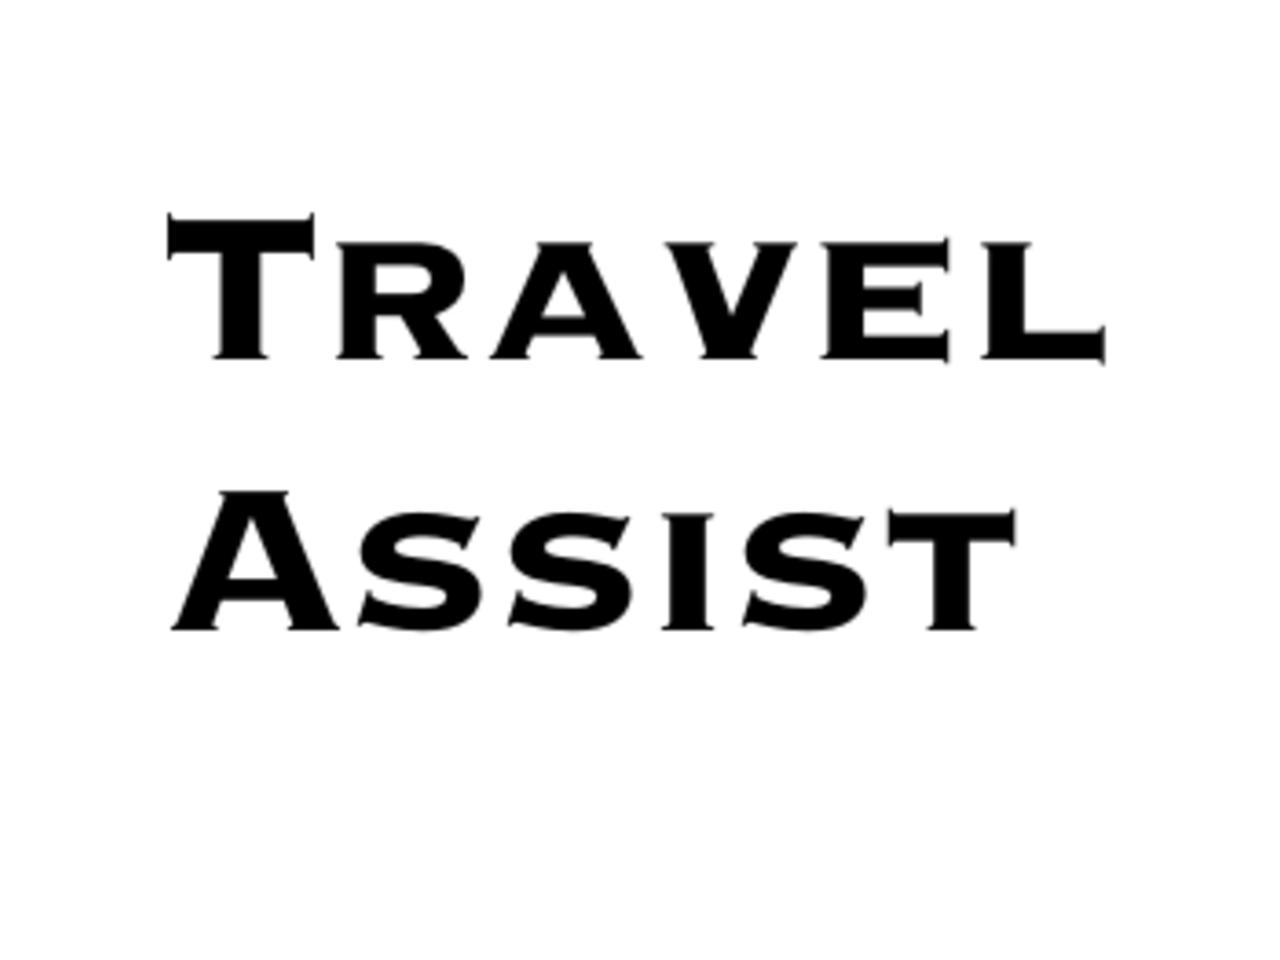 Travel Assist